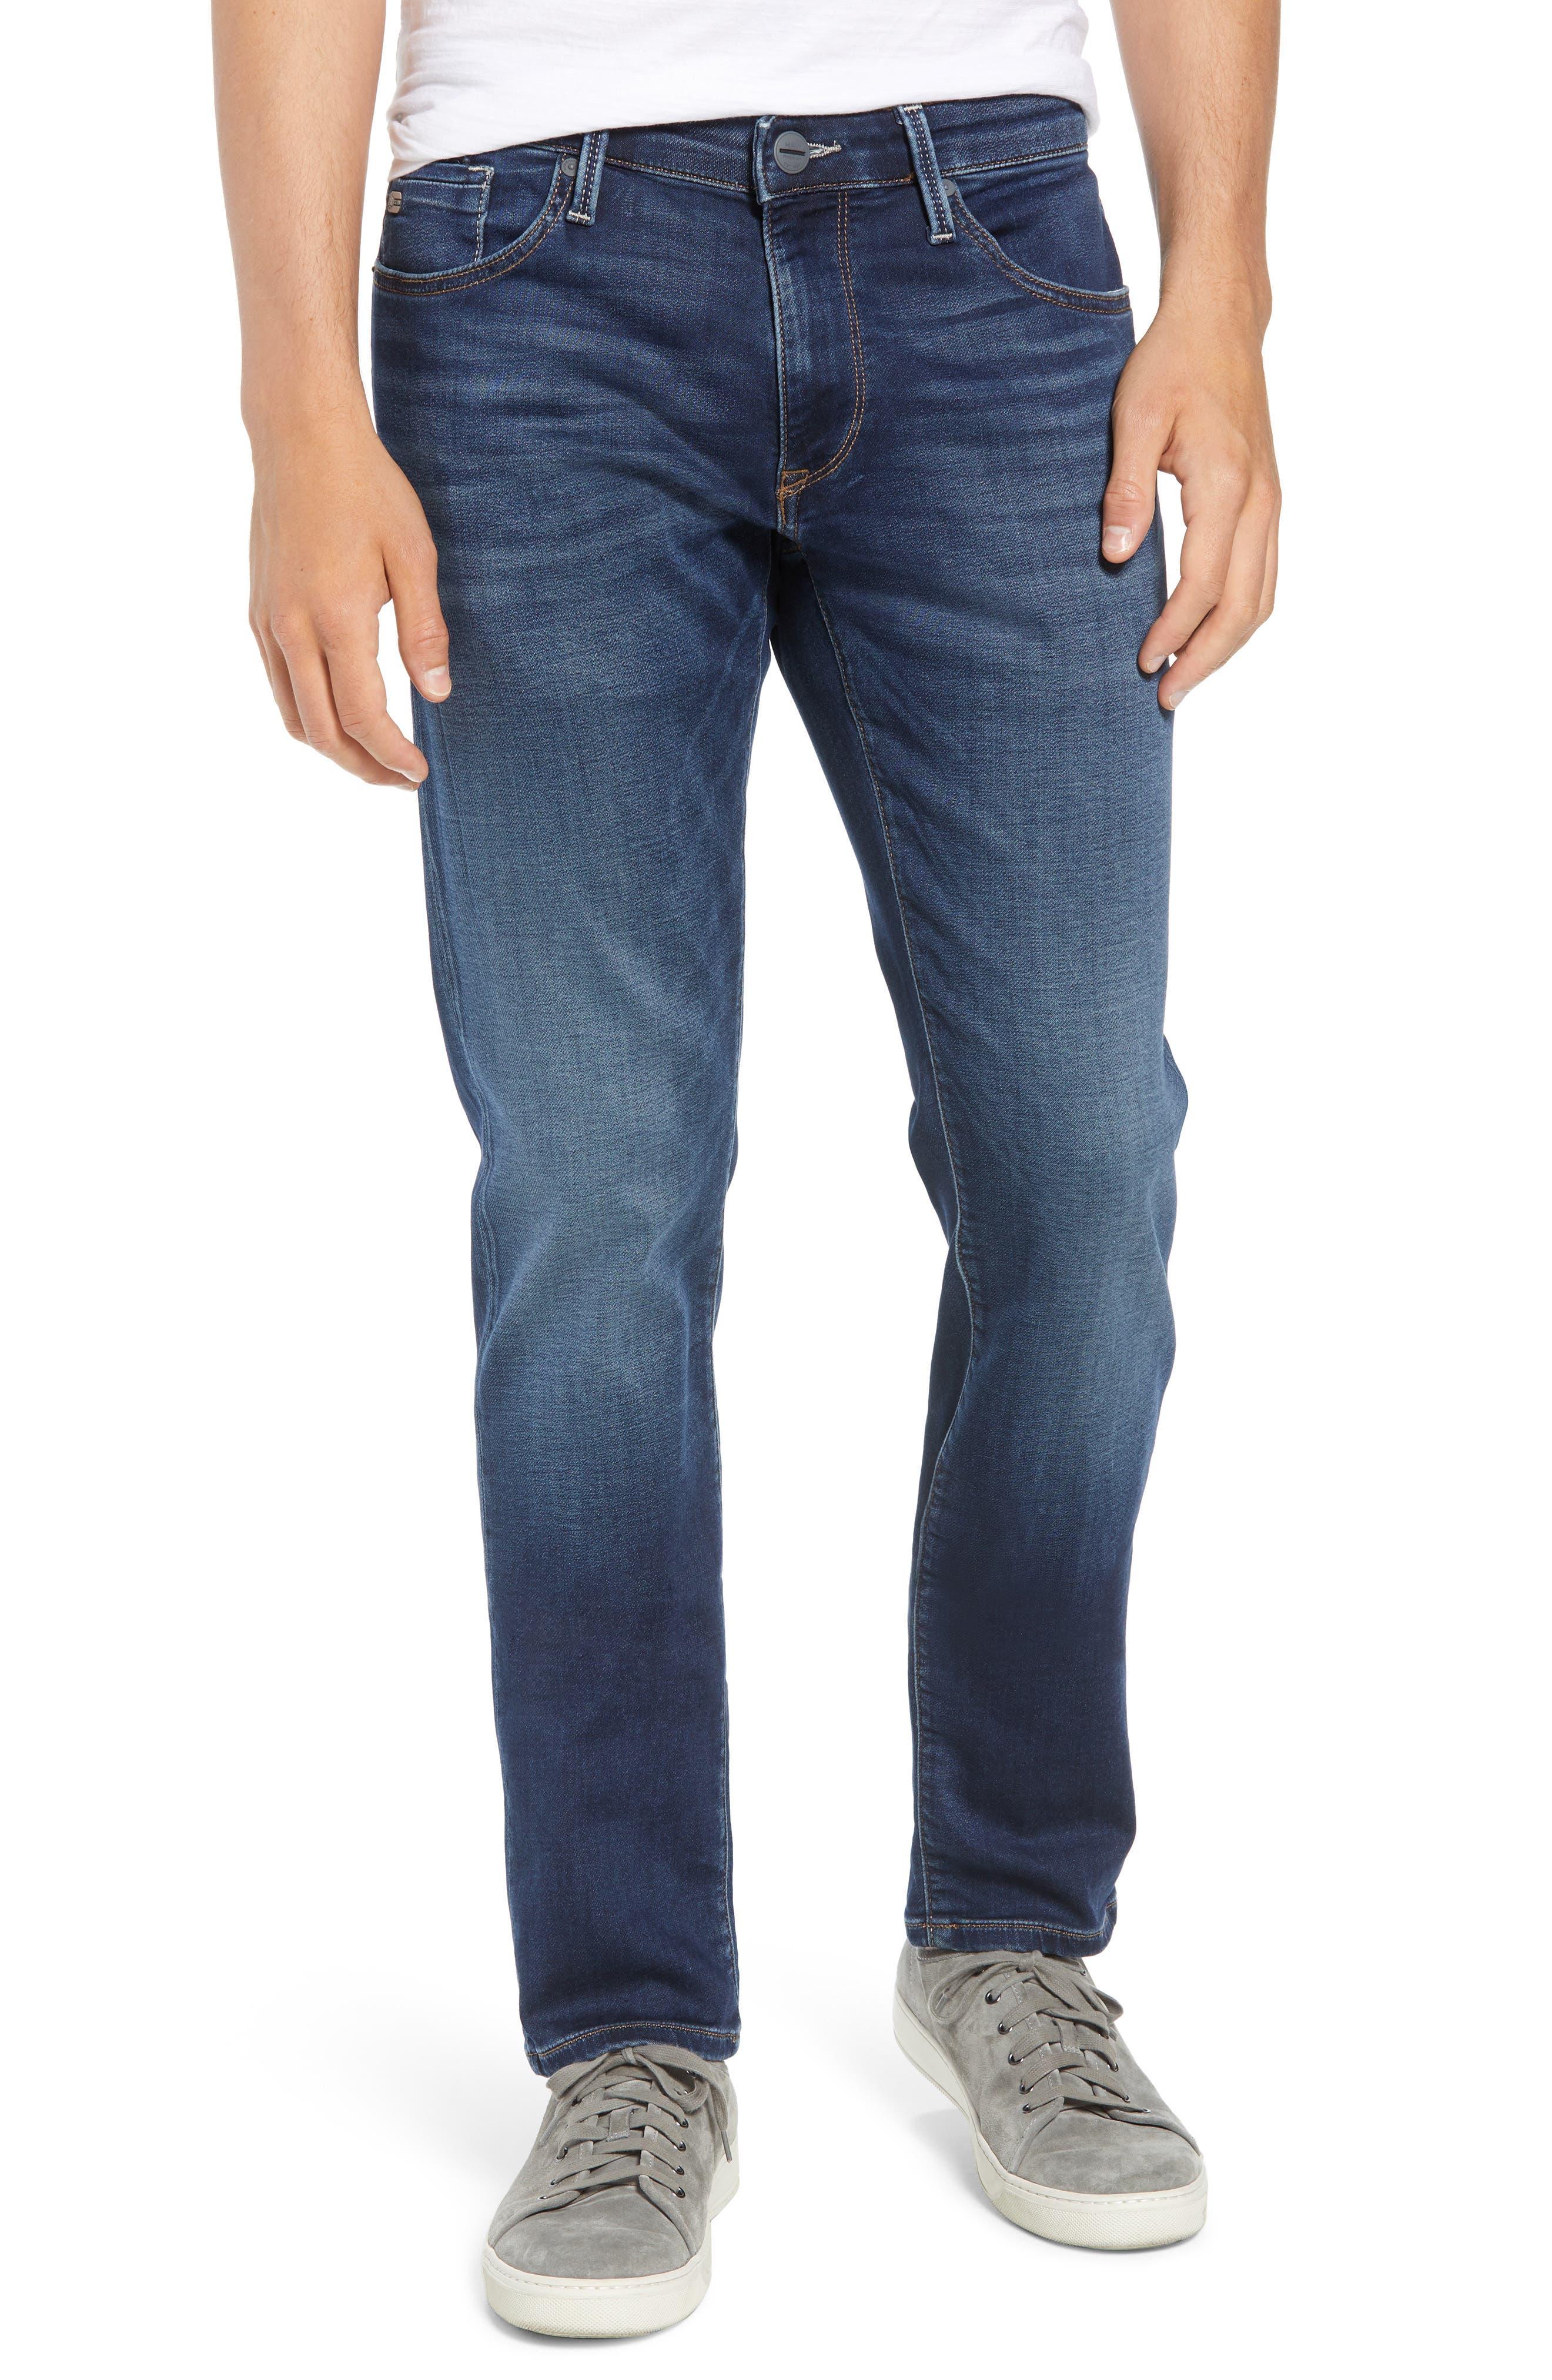 Jake Slim Fit Jeans,                             Main thumbnail 1, color,                             DARK SPORTY